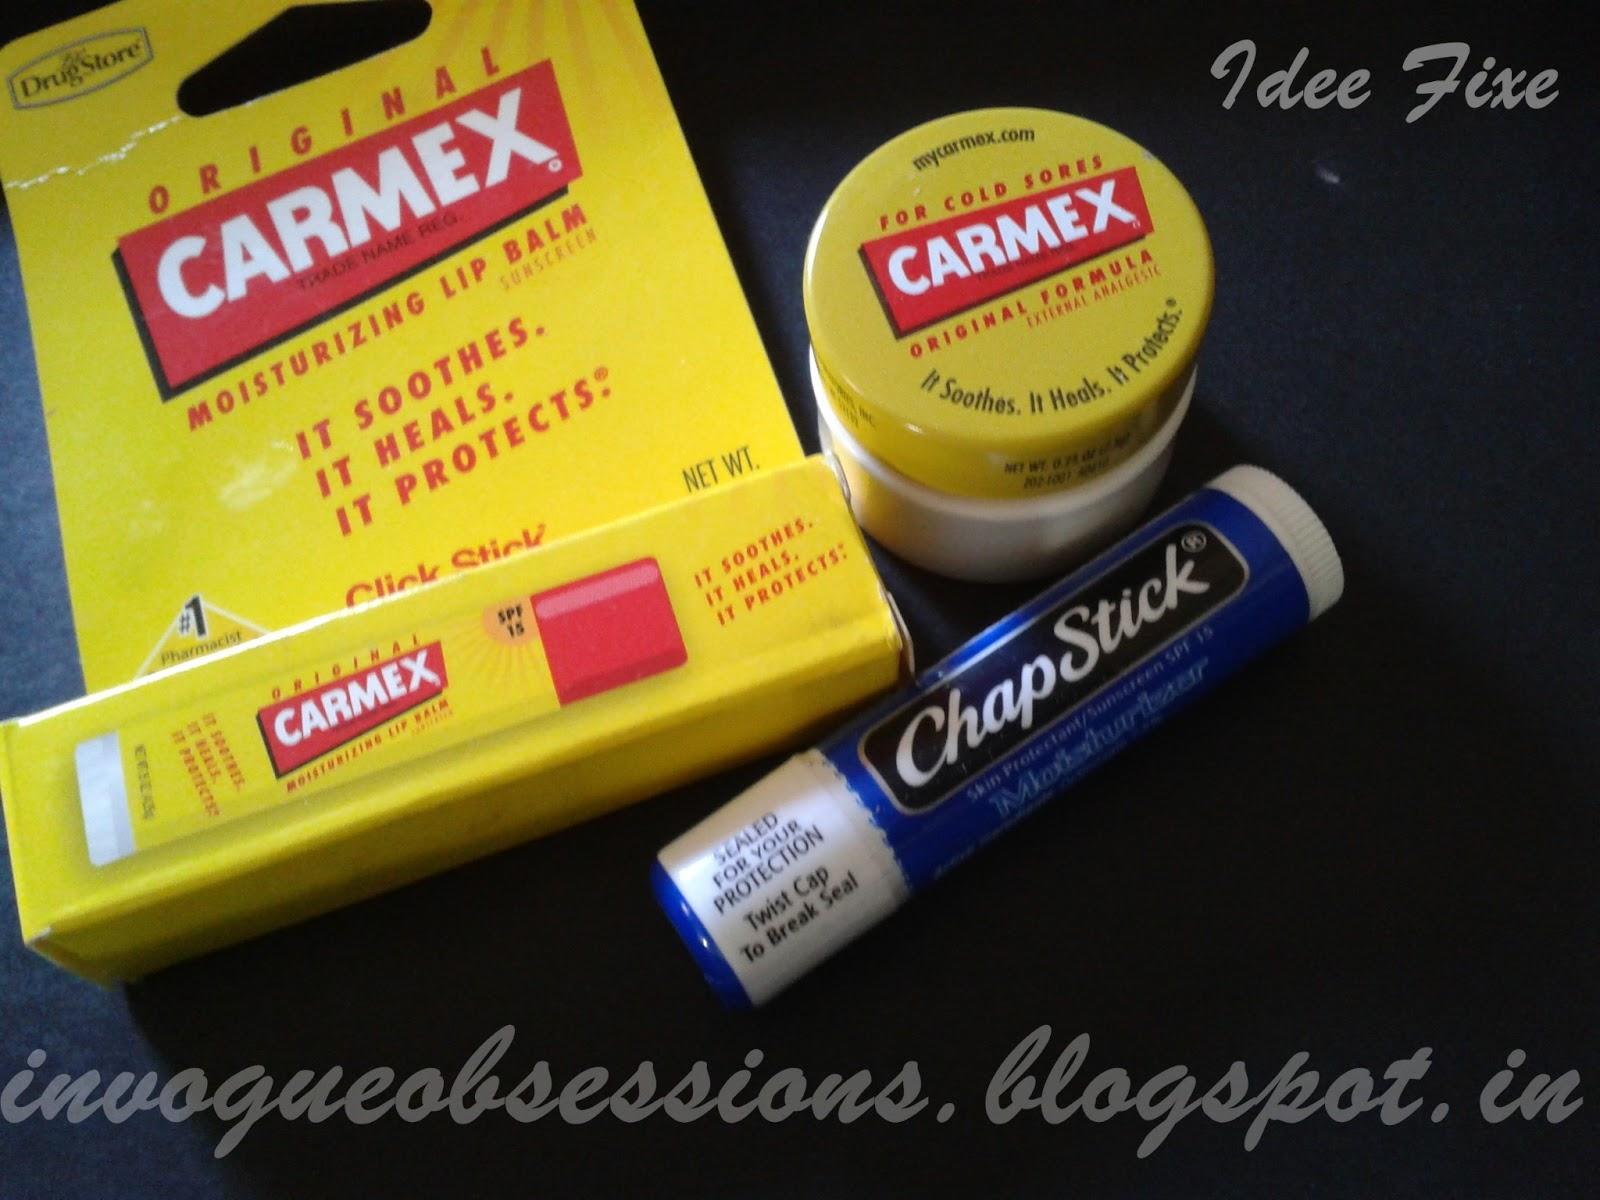 Carmex Original Formula Carmex Moisturizing Lip Balm Chapstick Moisturizer, Where to buy Carmex and Chapstick in India